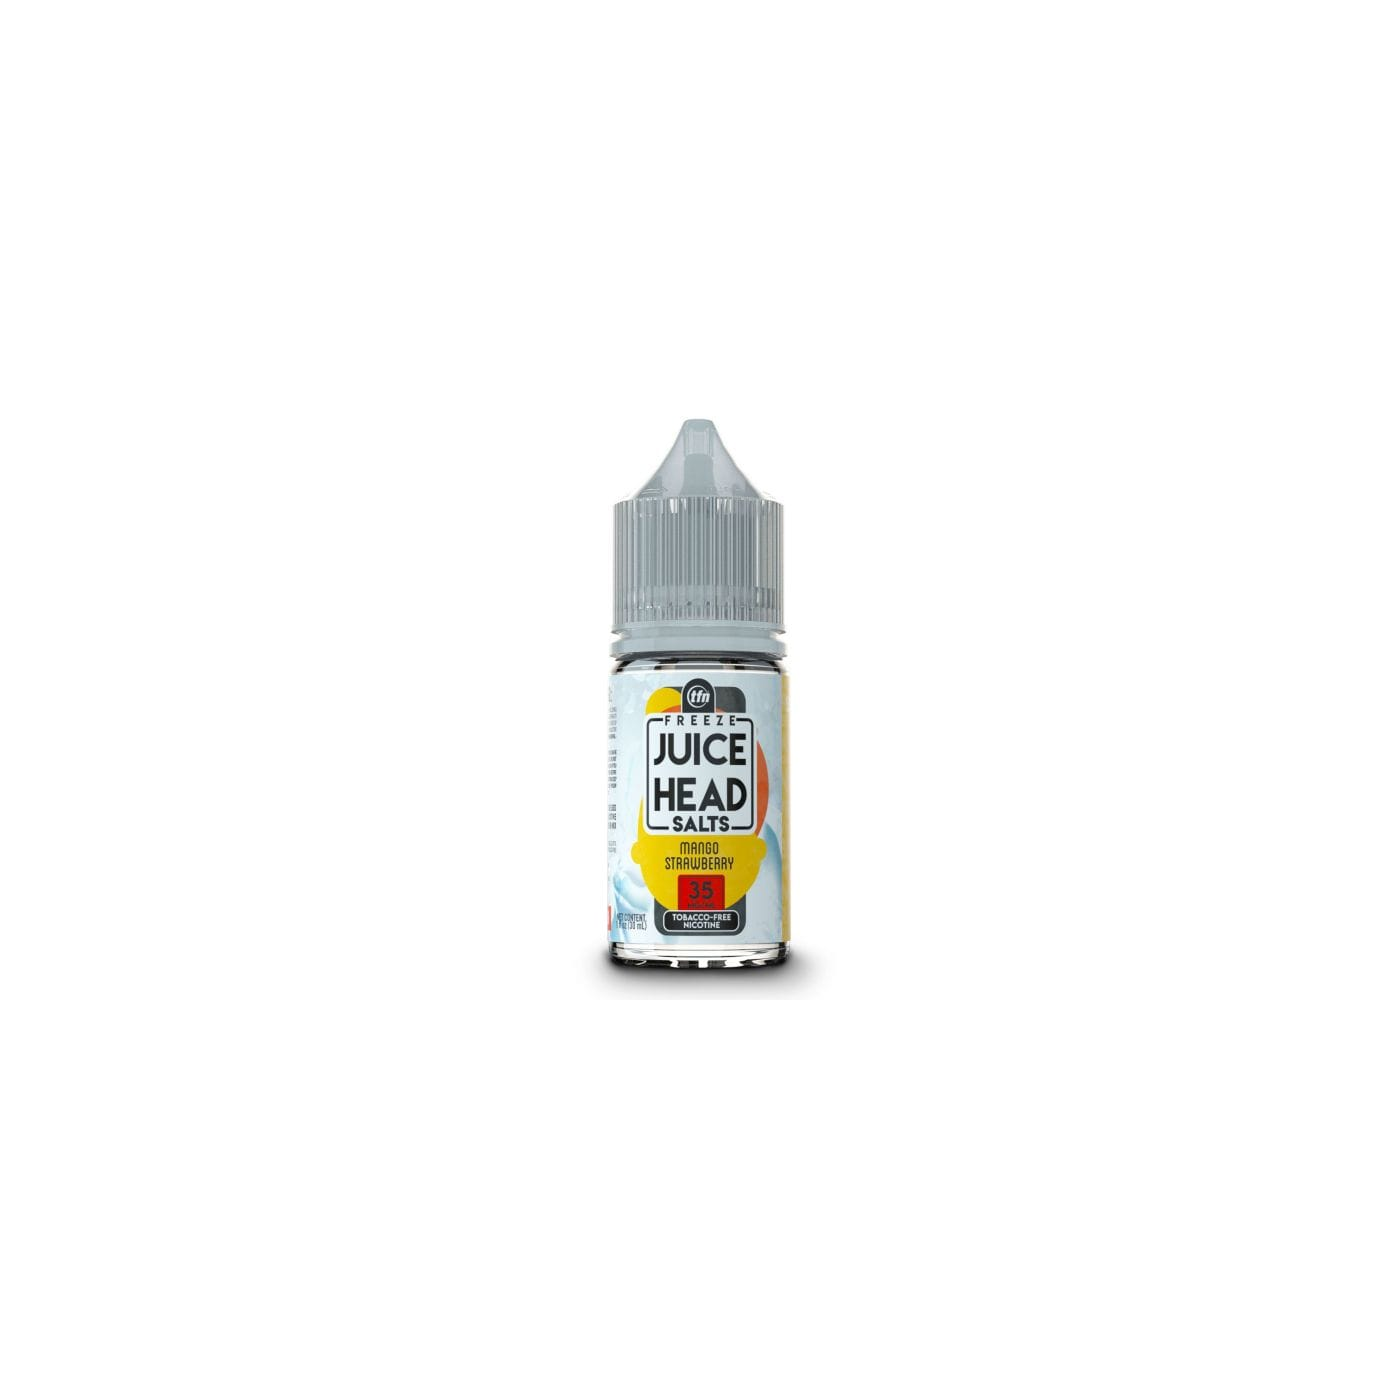 Juice Head TFN Salts Mango Strawberry Freeze